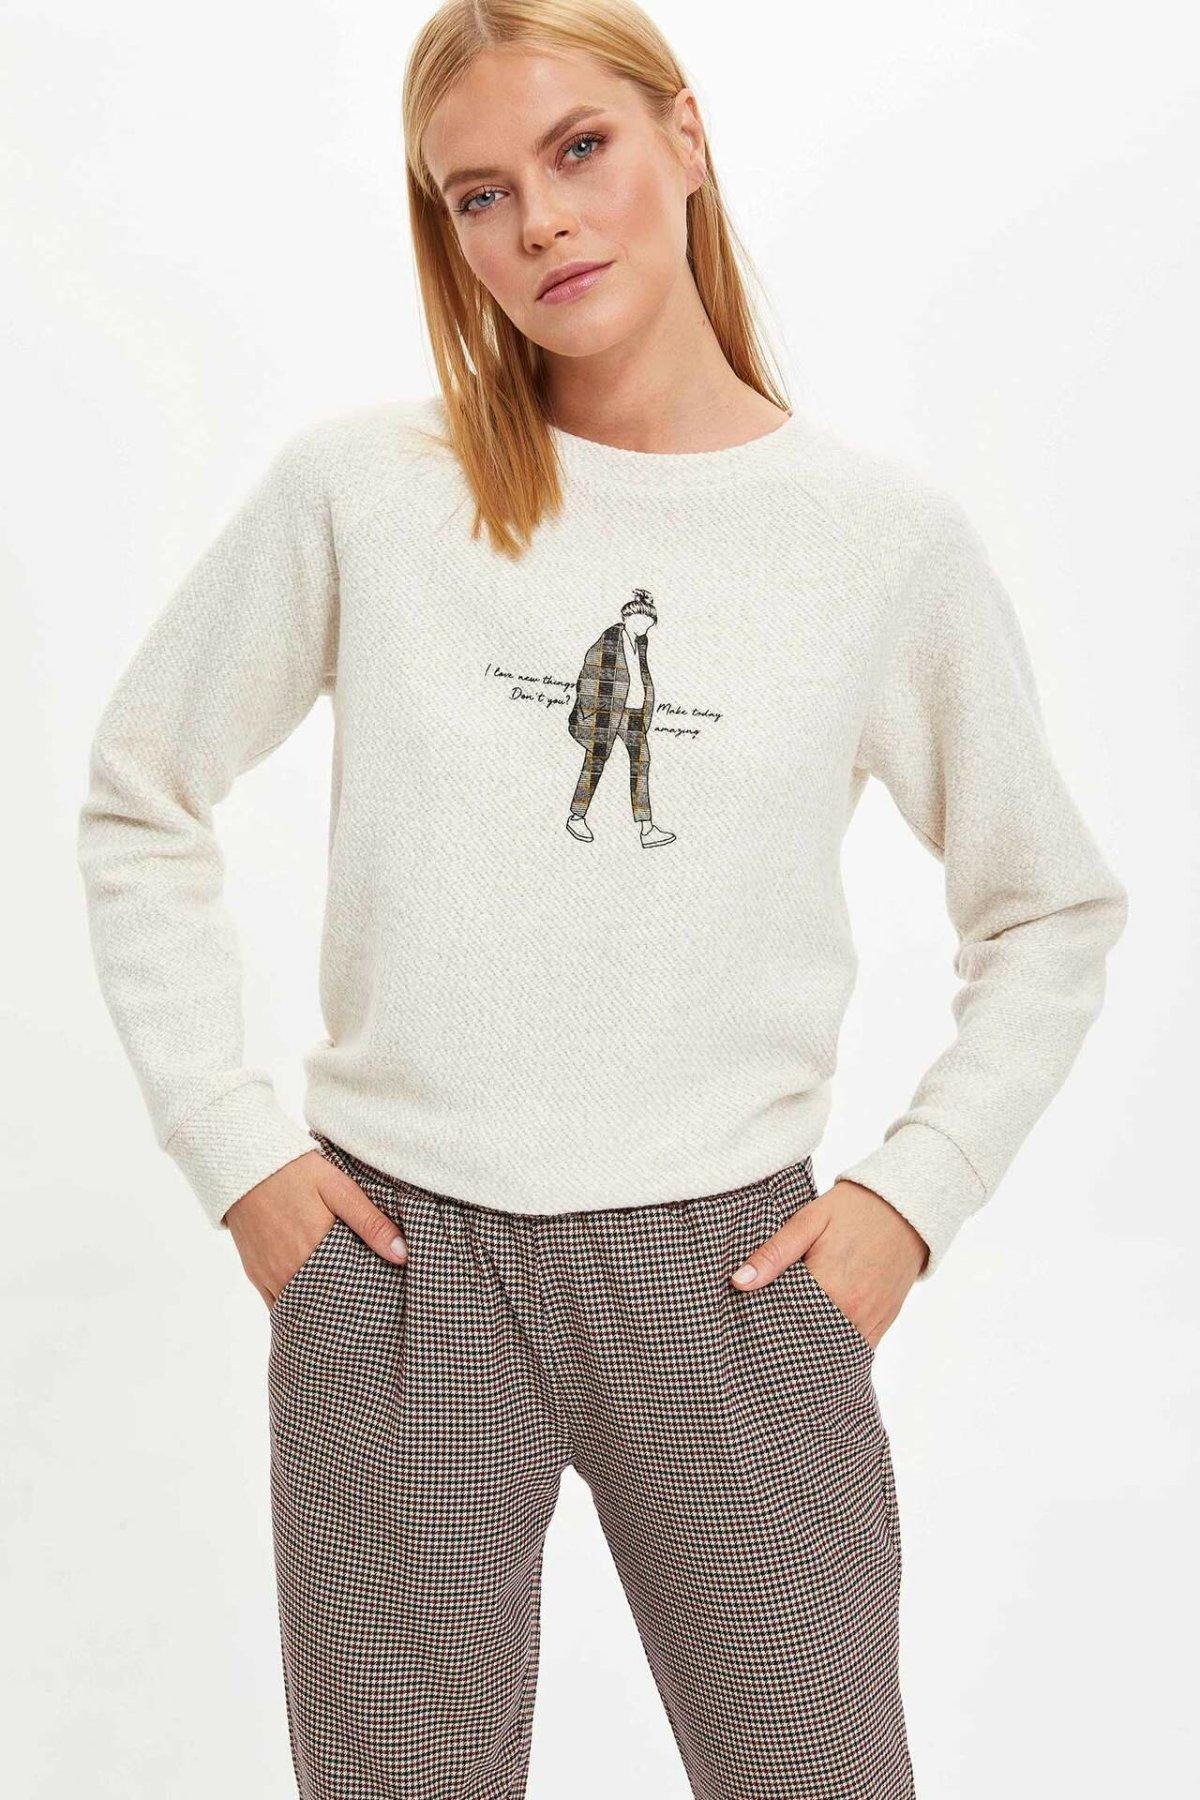 DeFacto Woman White O-neck Sweat Shirt Women Autumn Casual Pullovers Cool Image Design Female Tops Long Sleeve Top-M3359AZ19WN